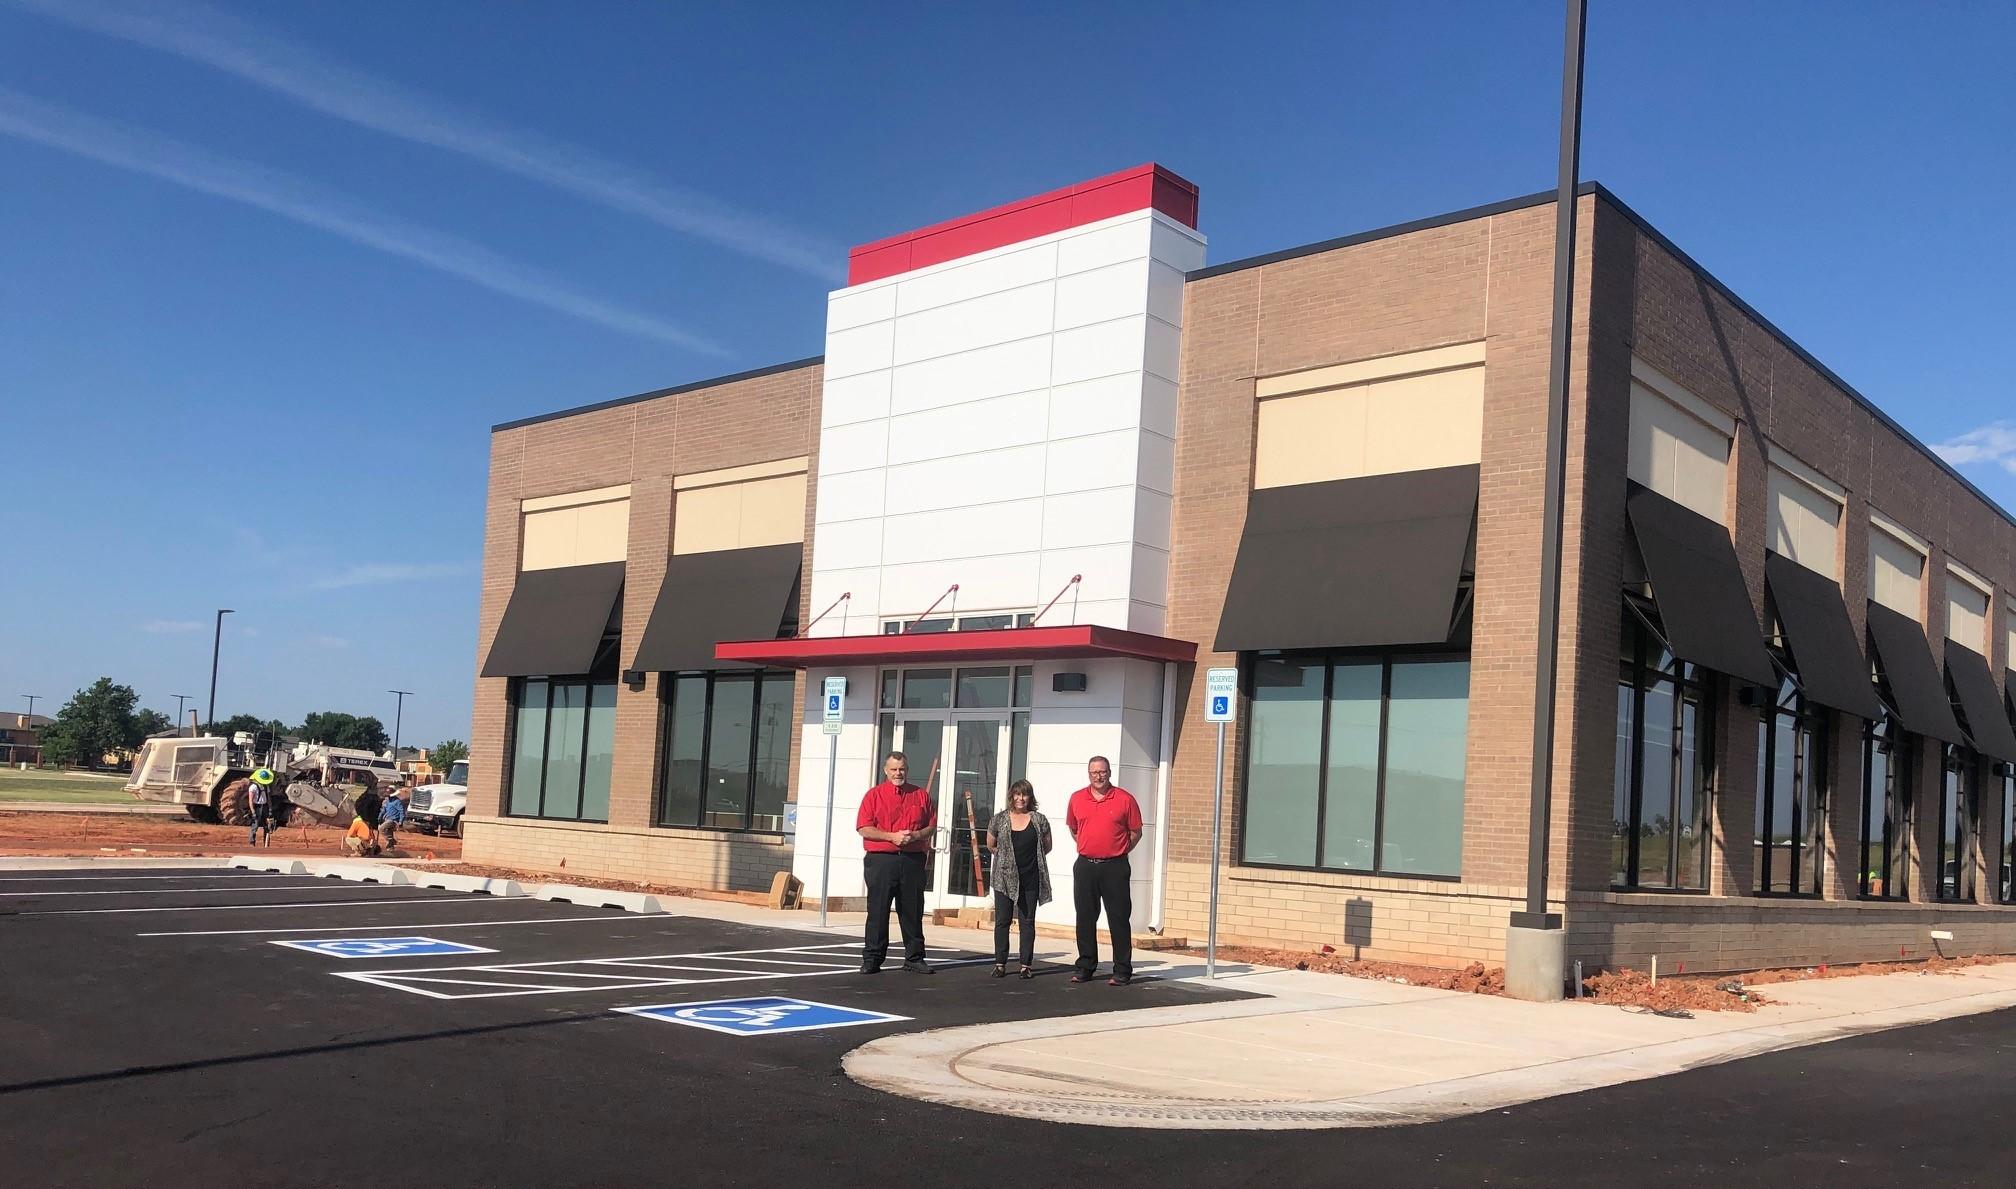 Aaa Opening Car Care Location In Quail Springs Area Of Okc Kfor Com Oklahoma City